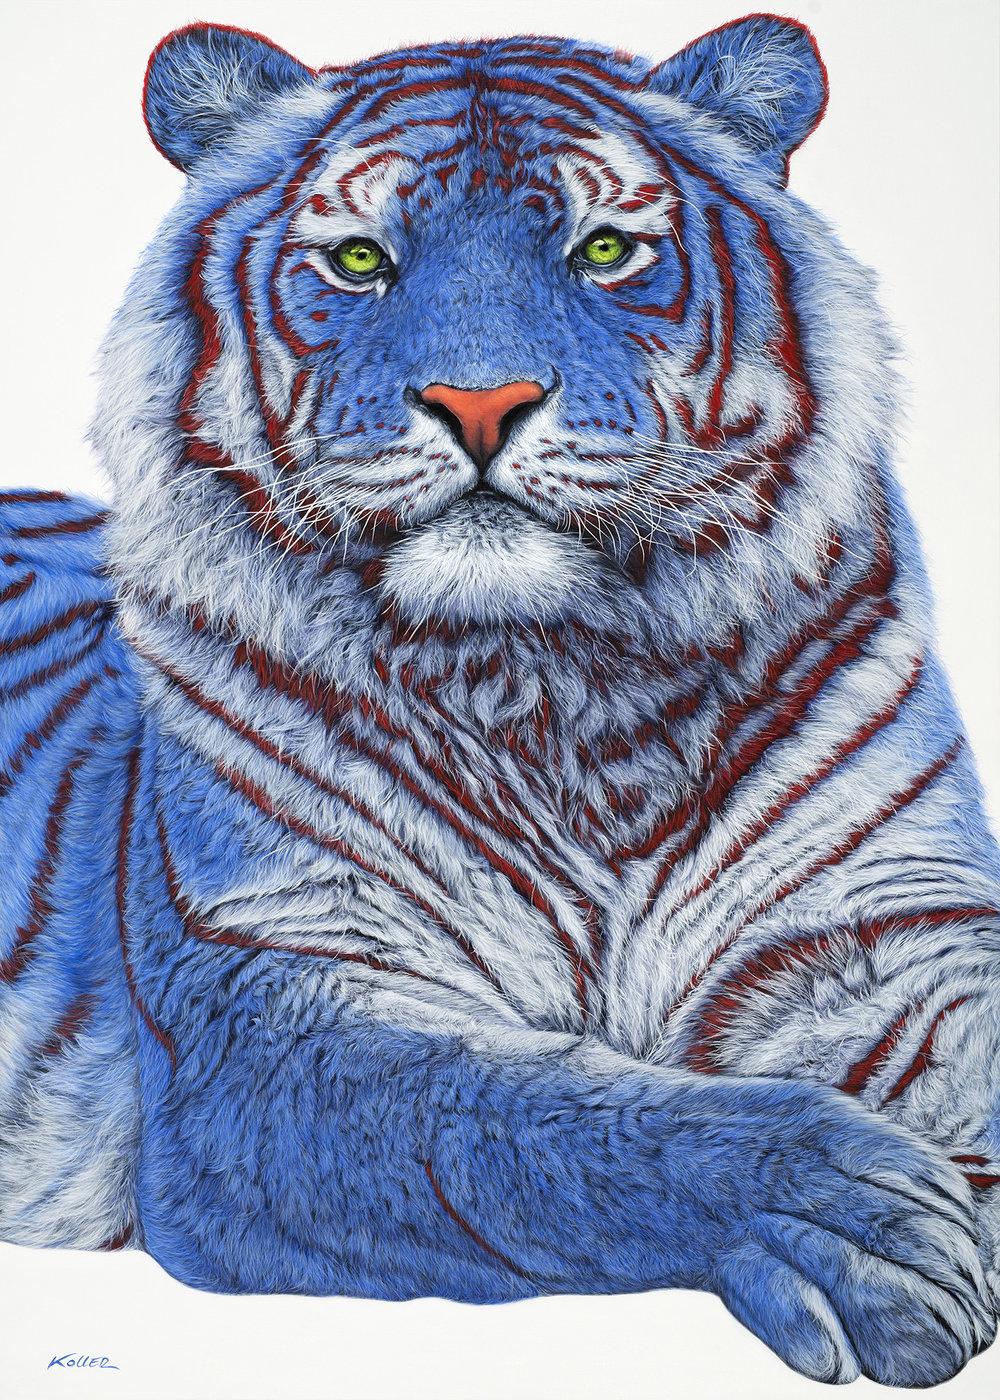 Helmut Koller, Siberian Tiger in Blue